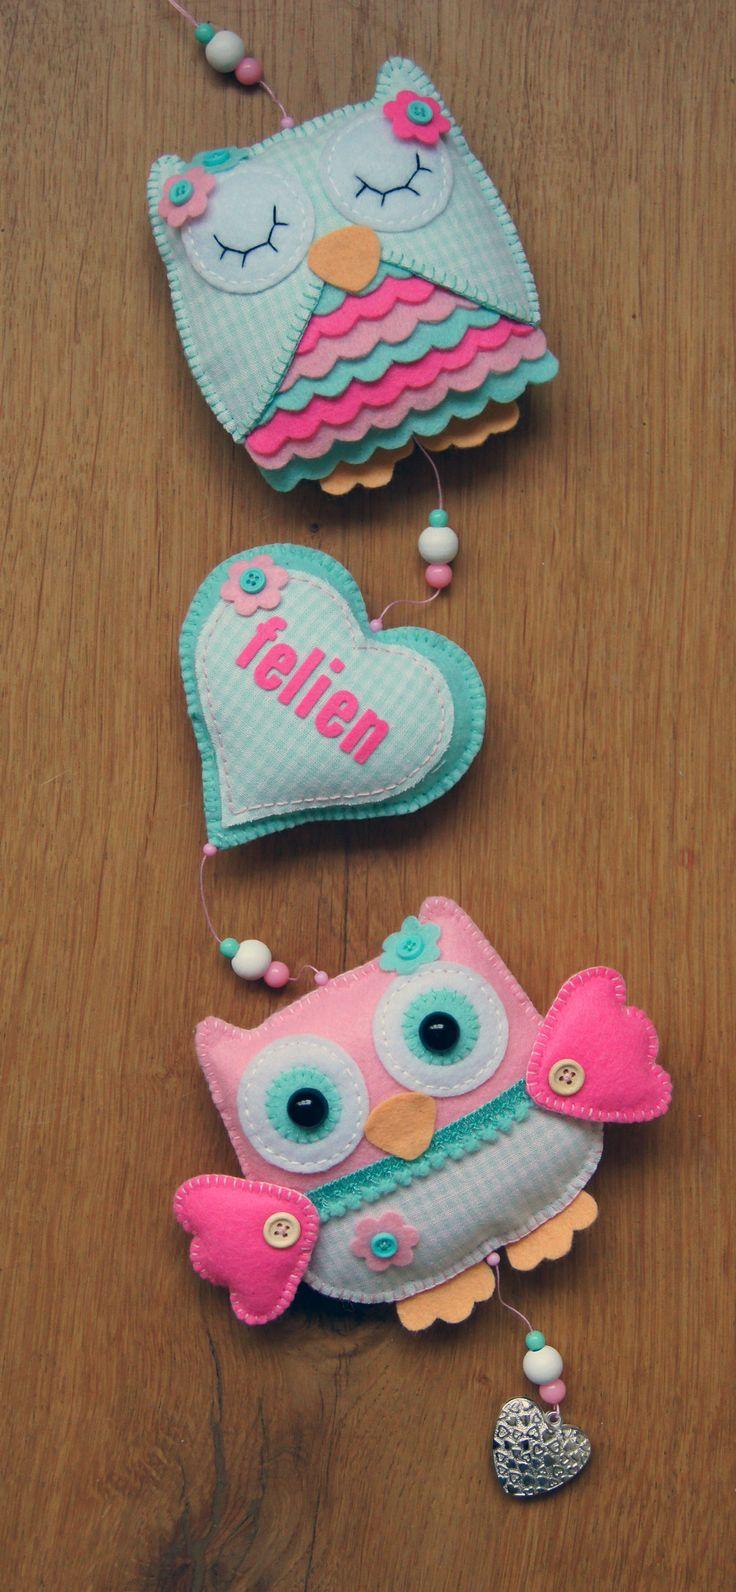 Handmade by JoHo - Uilenslinger mint/roze - owls felt